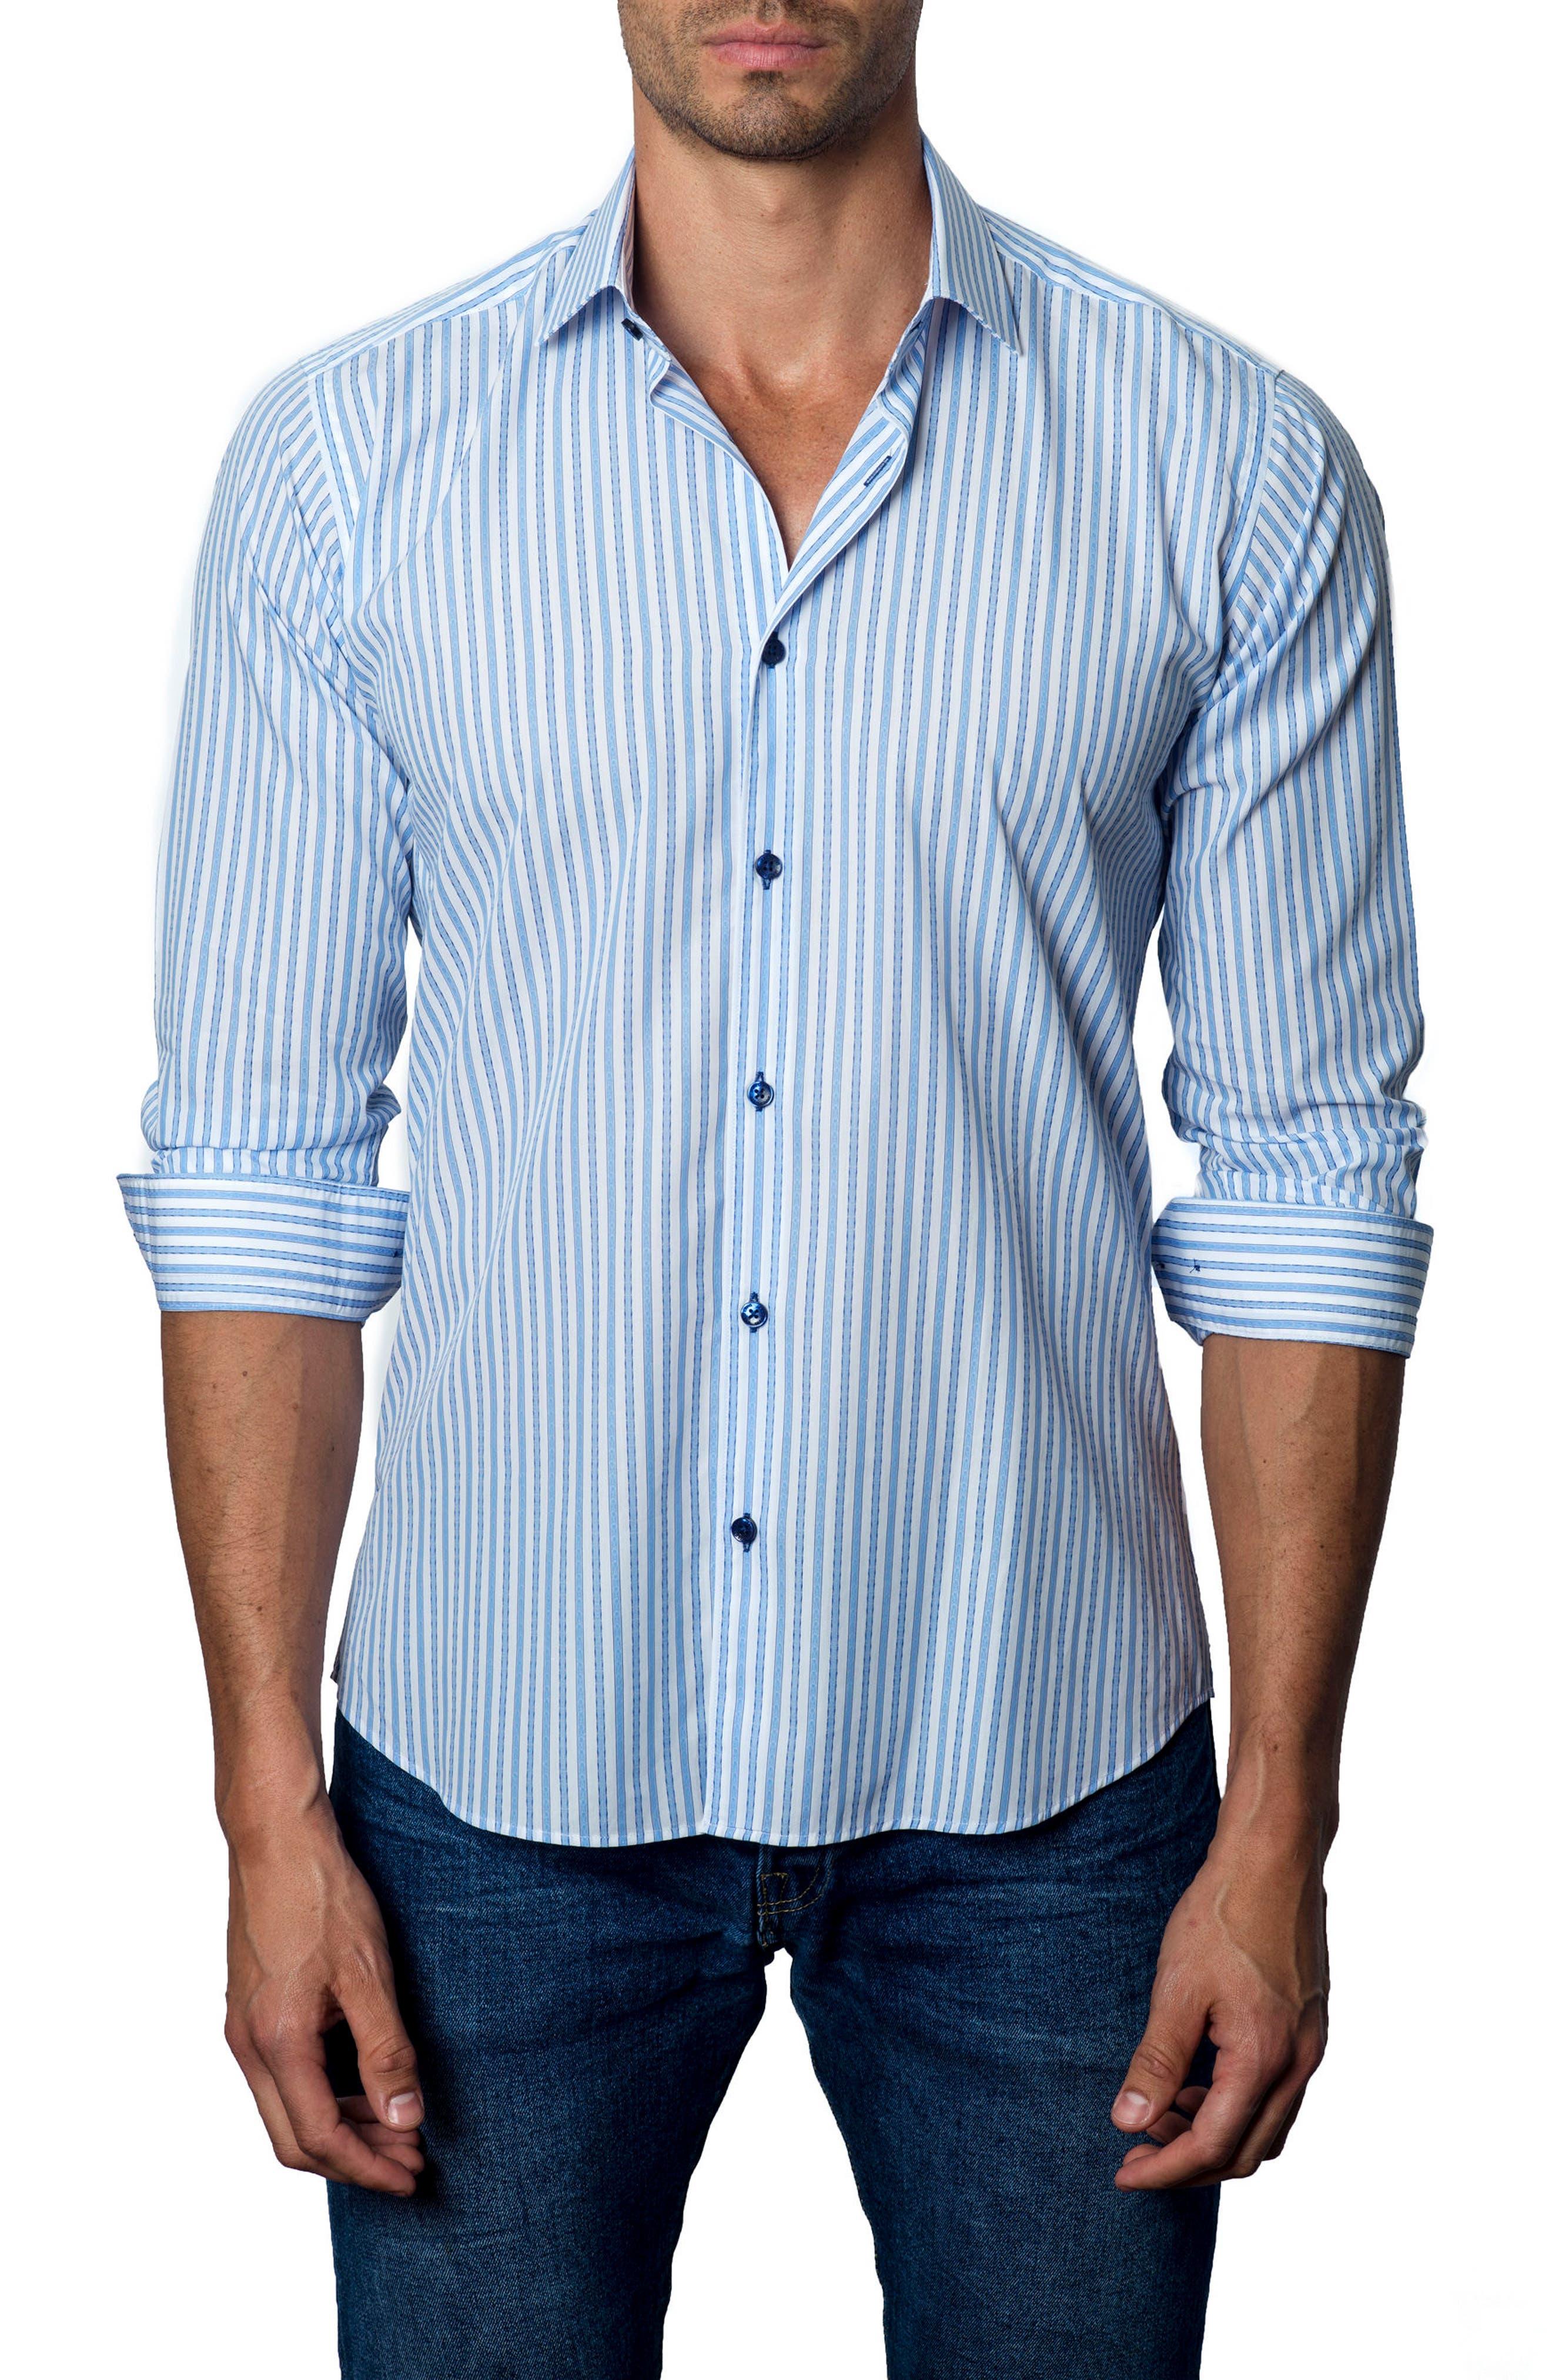 Alternate Image 1 Selected - Jared Lang Trim Fit Stripe Sport Shirt